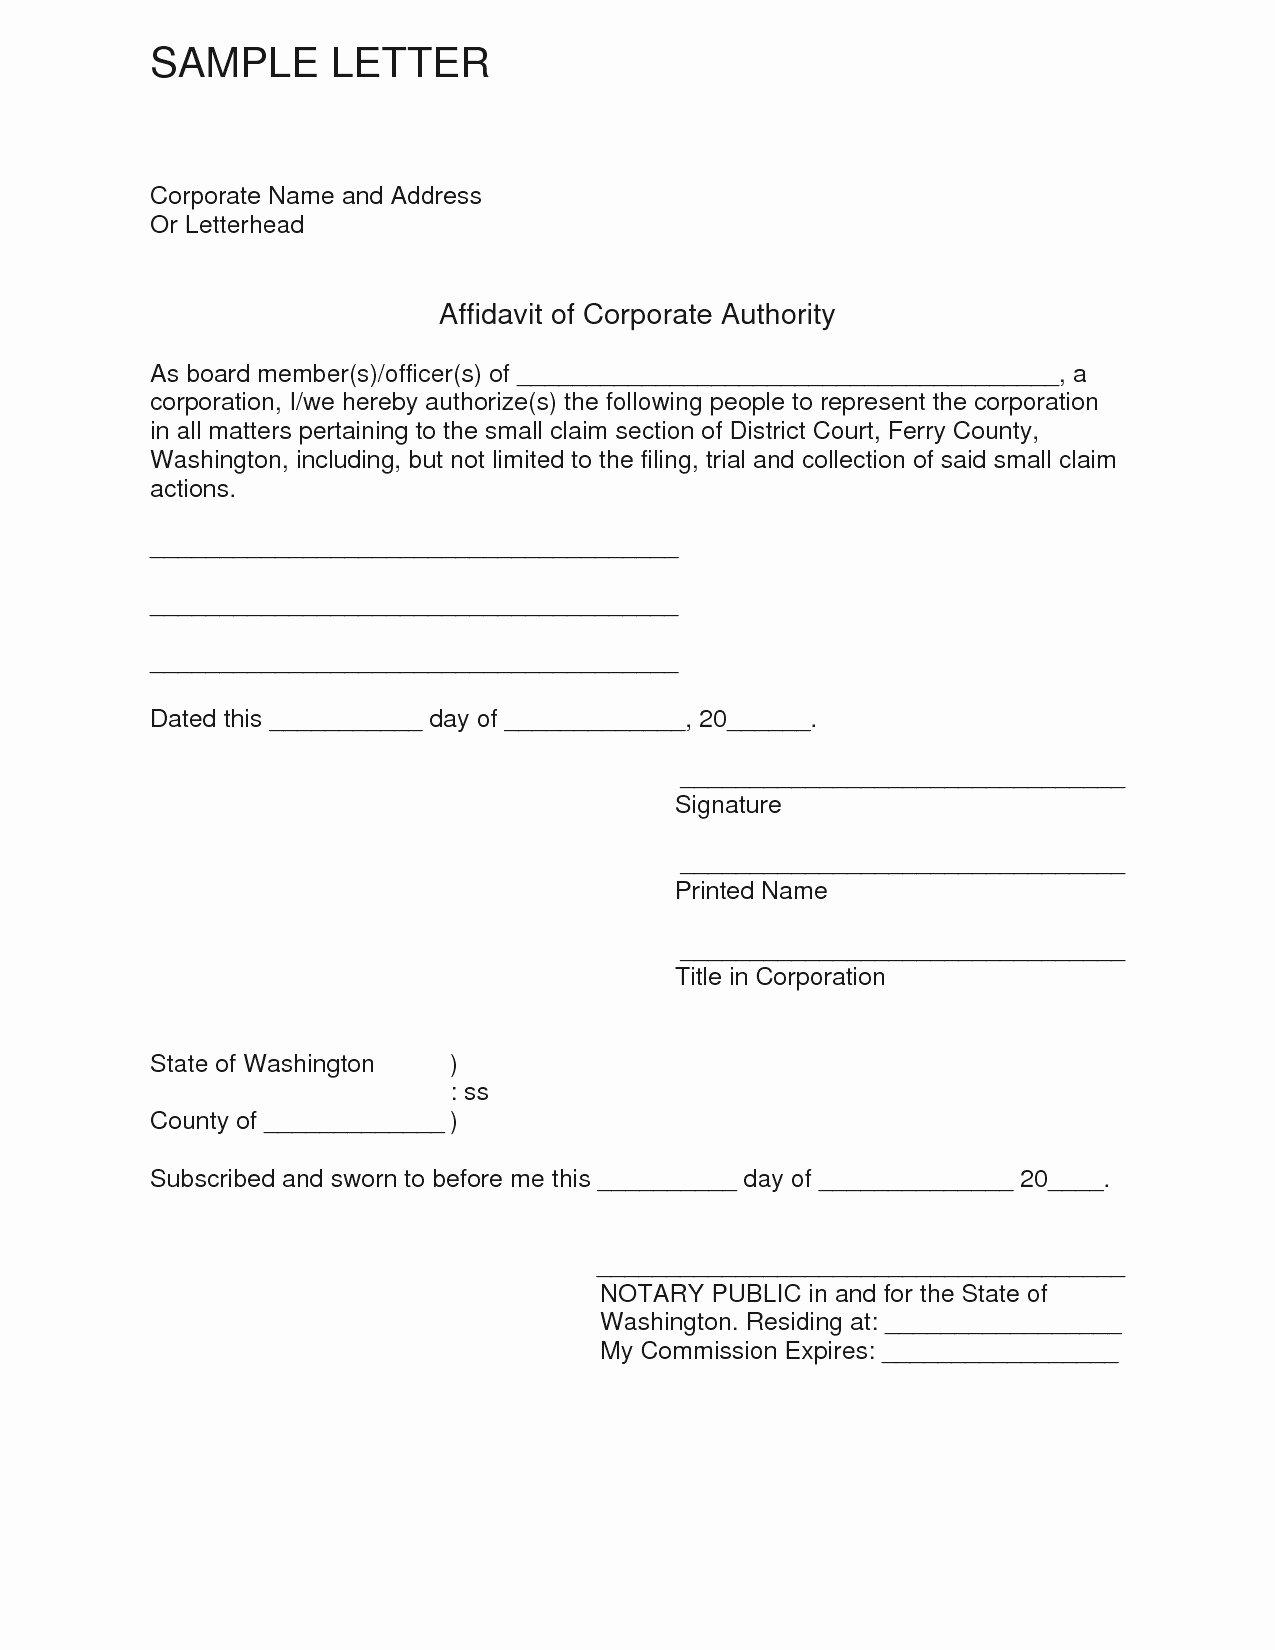 Affidavit Of Support Sample Letter Fresh Affidavit Letter Template Bluemooncatering